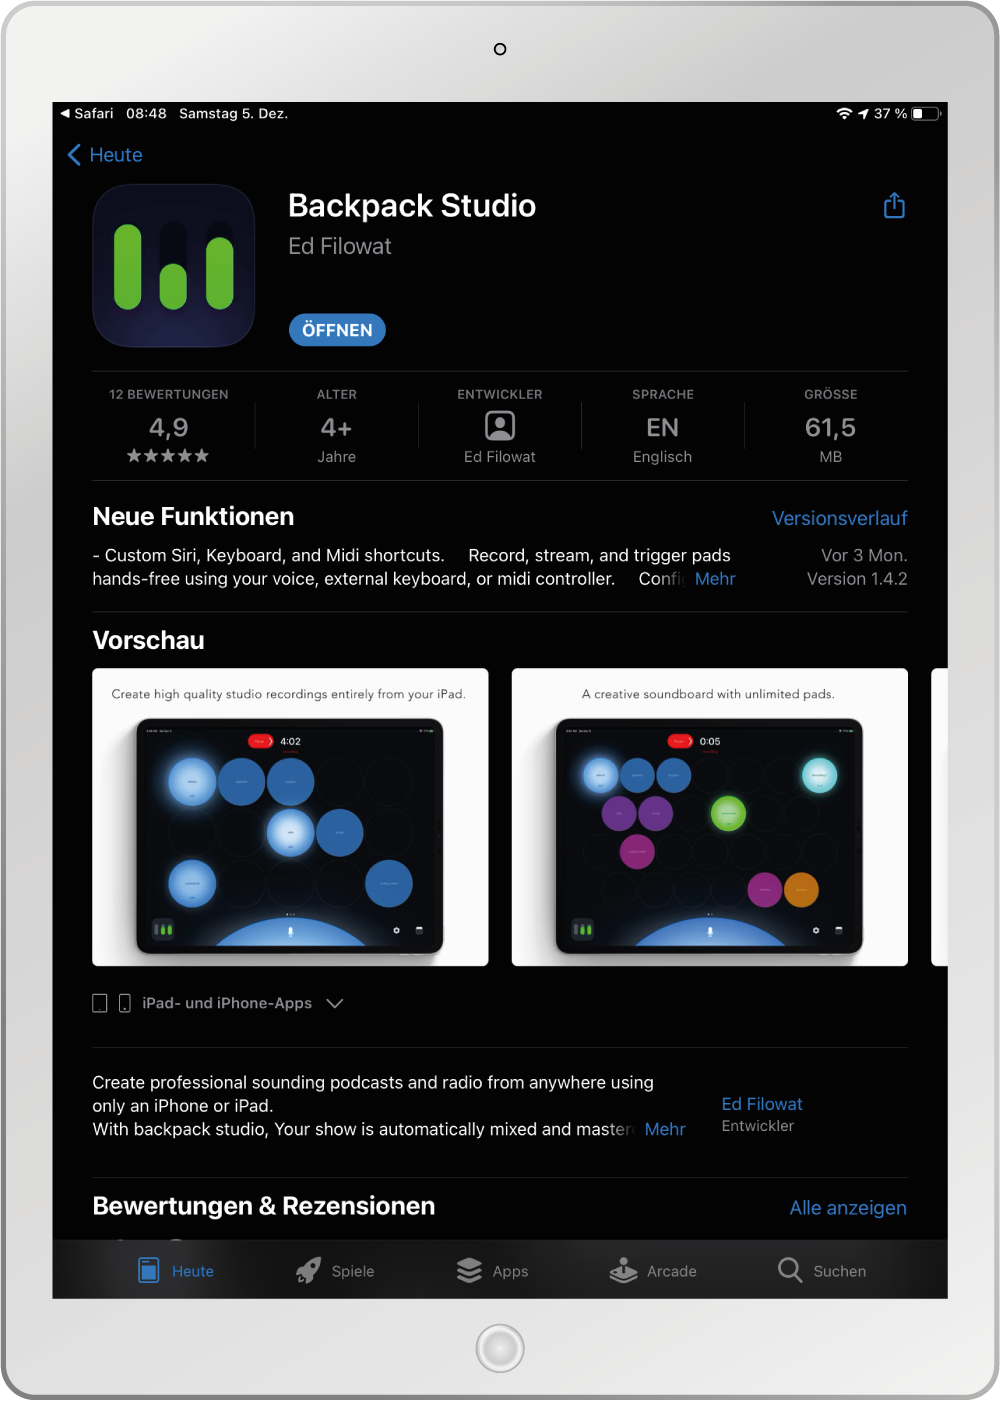 Mockup-Tablet-App-Installieren